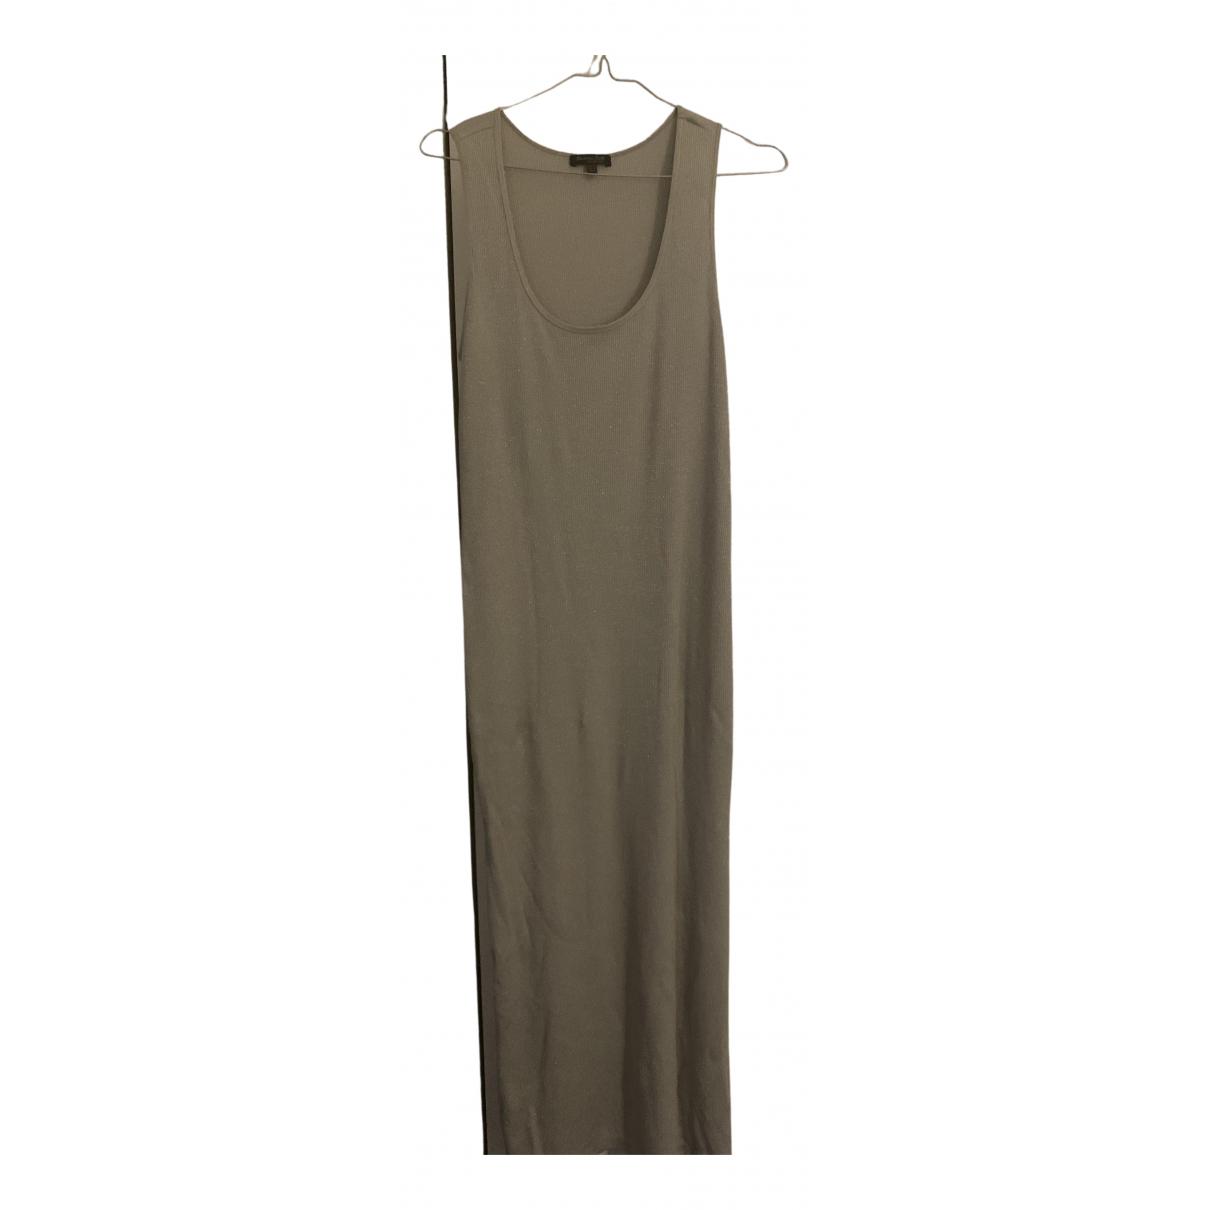 Massimo Dutti N Metallic Cotton dress for Women M International